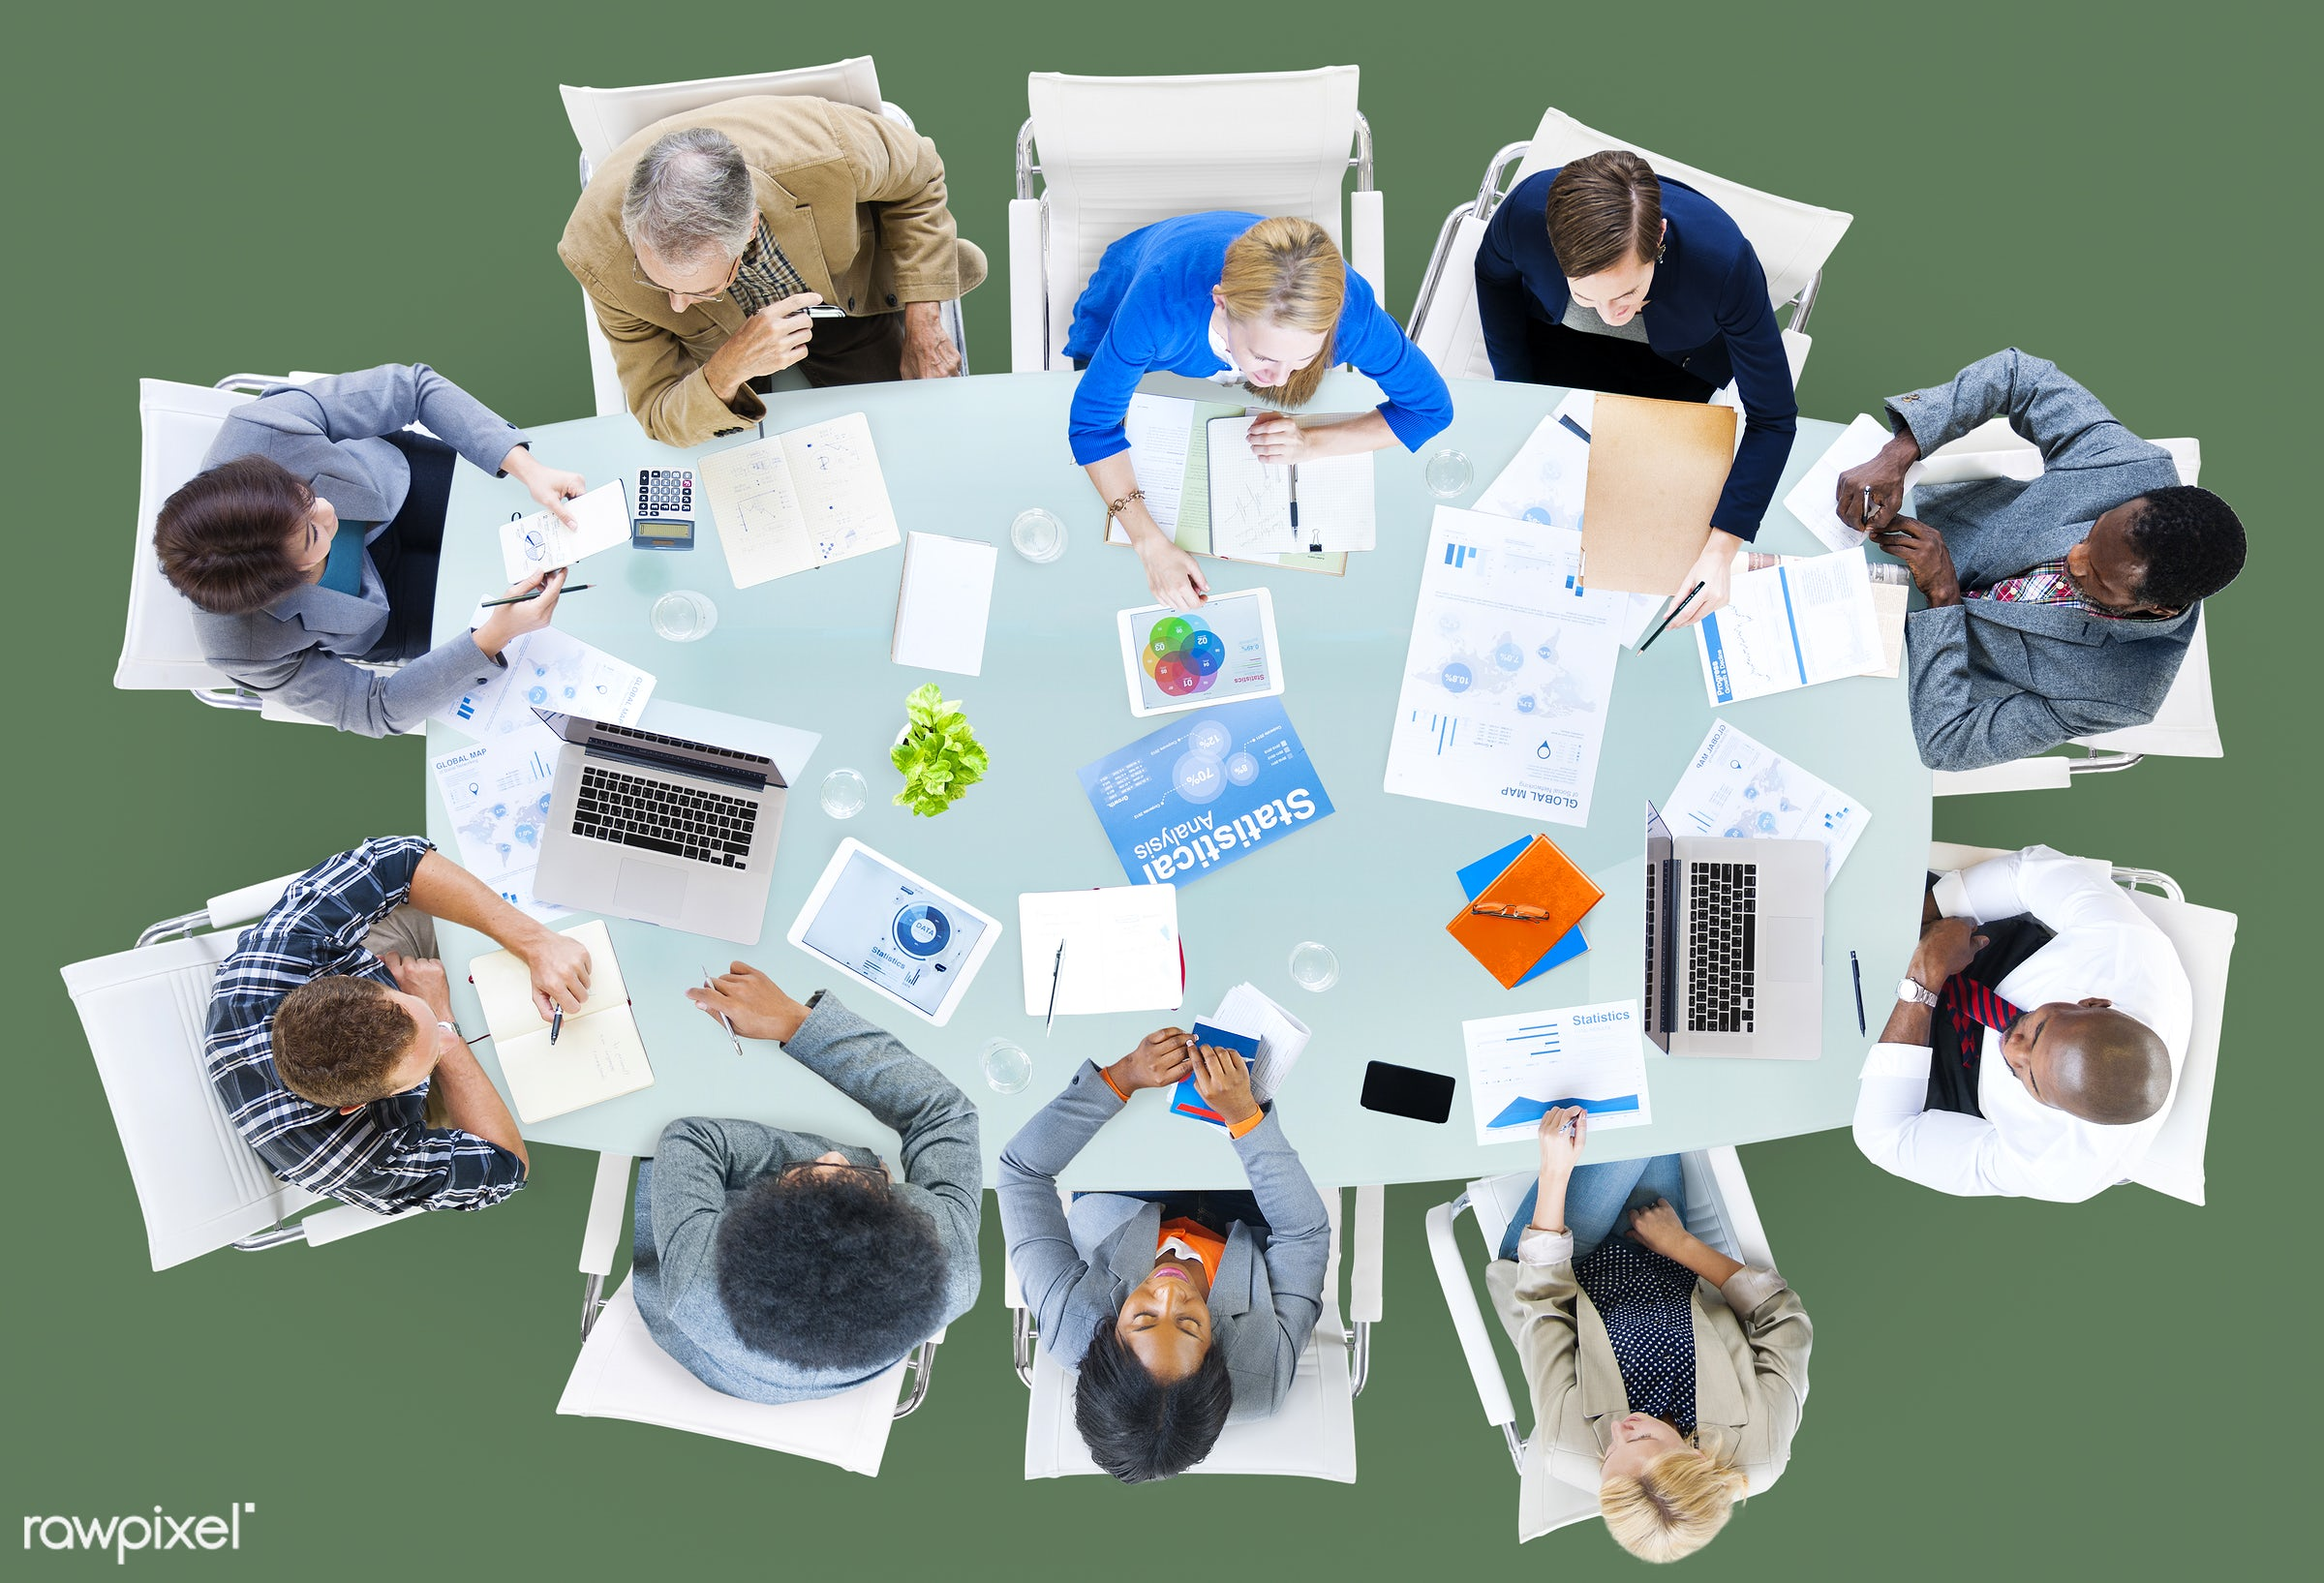 aerial view, brainstorming, business, business people, businessmen, businesswomen, casual, communication, concrete floor,...